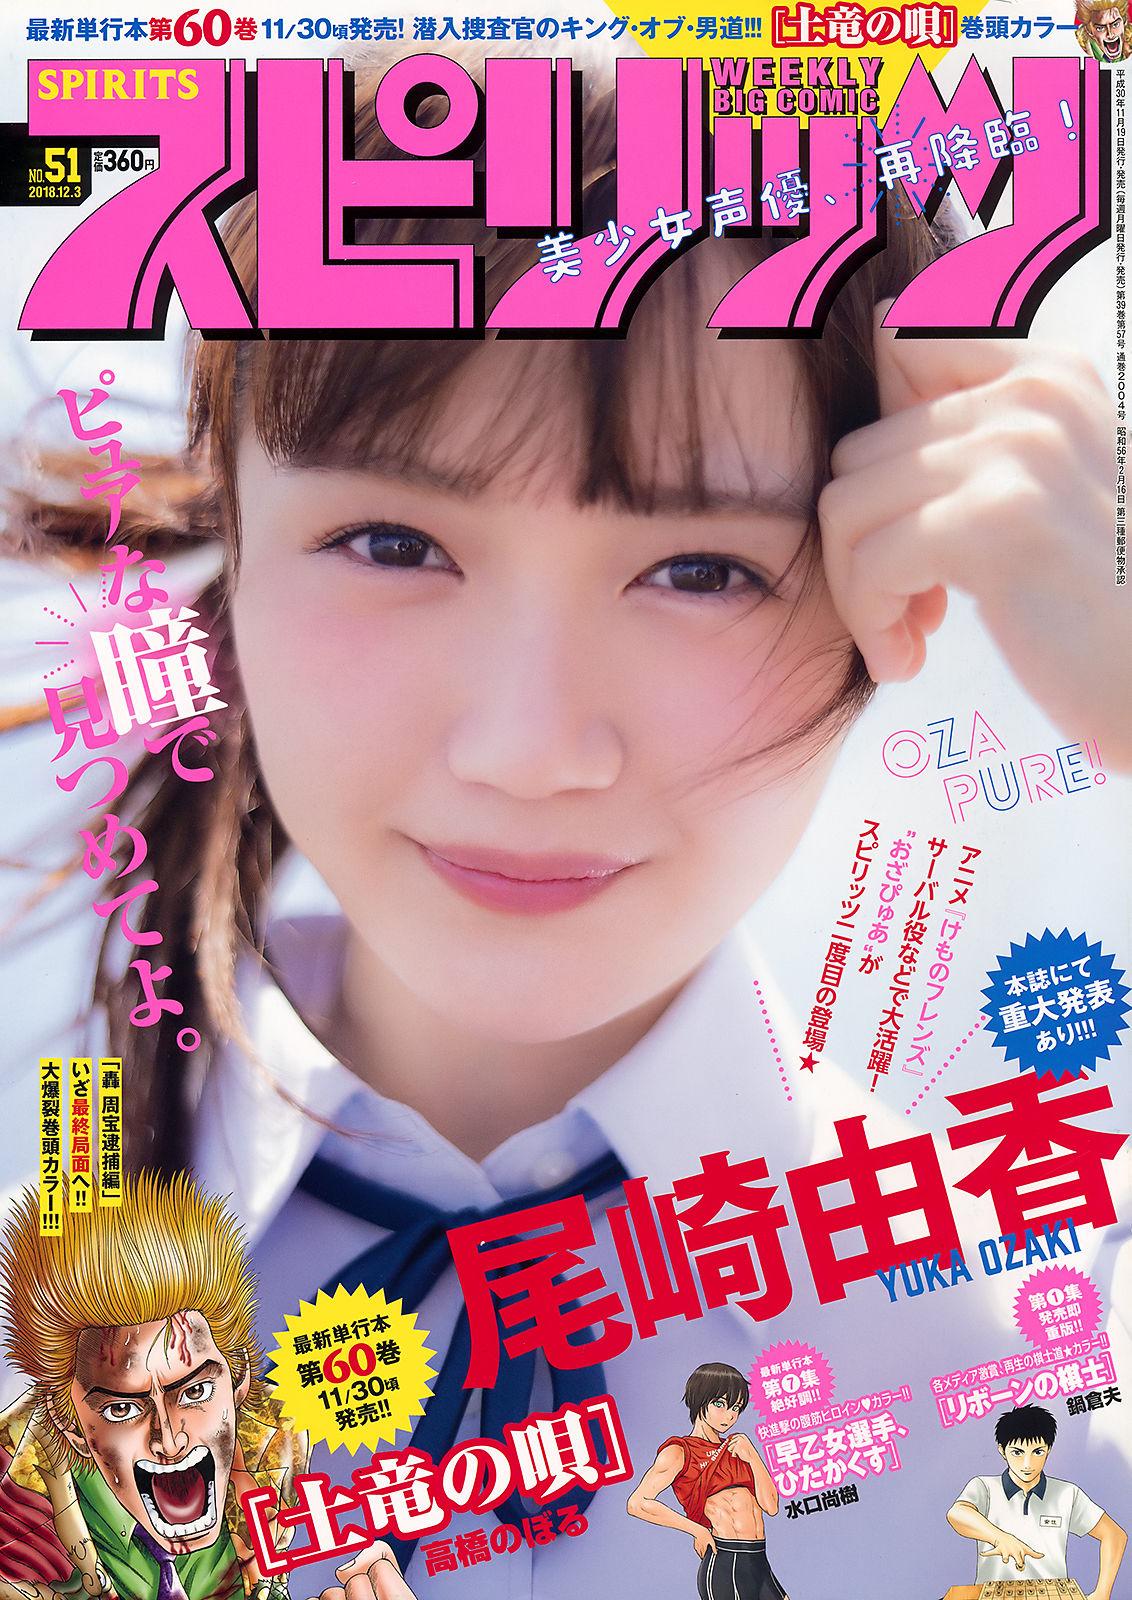 VOL.866 [Weekly Big Comic Spirits]软妹:尾崎由香超高清写真套图(7P)